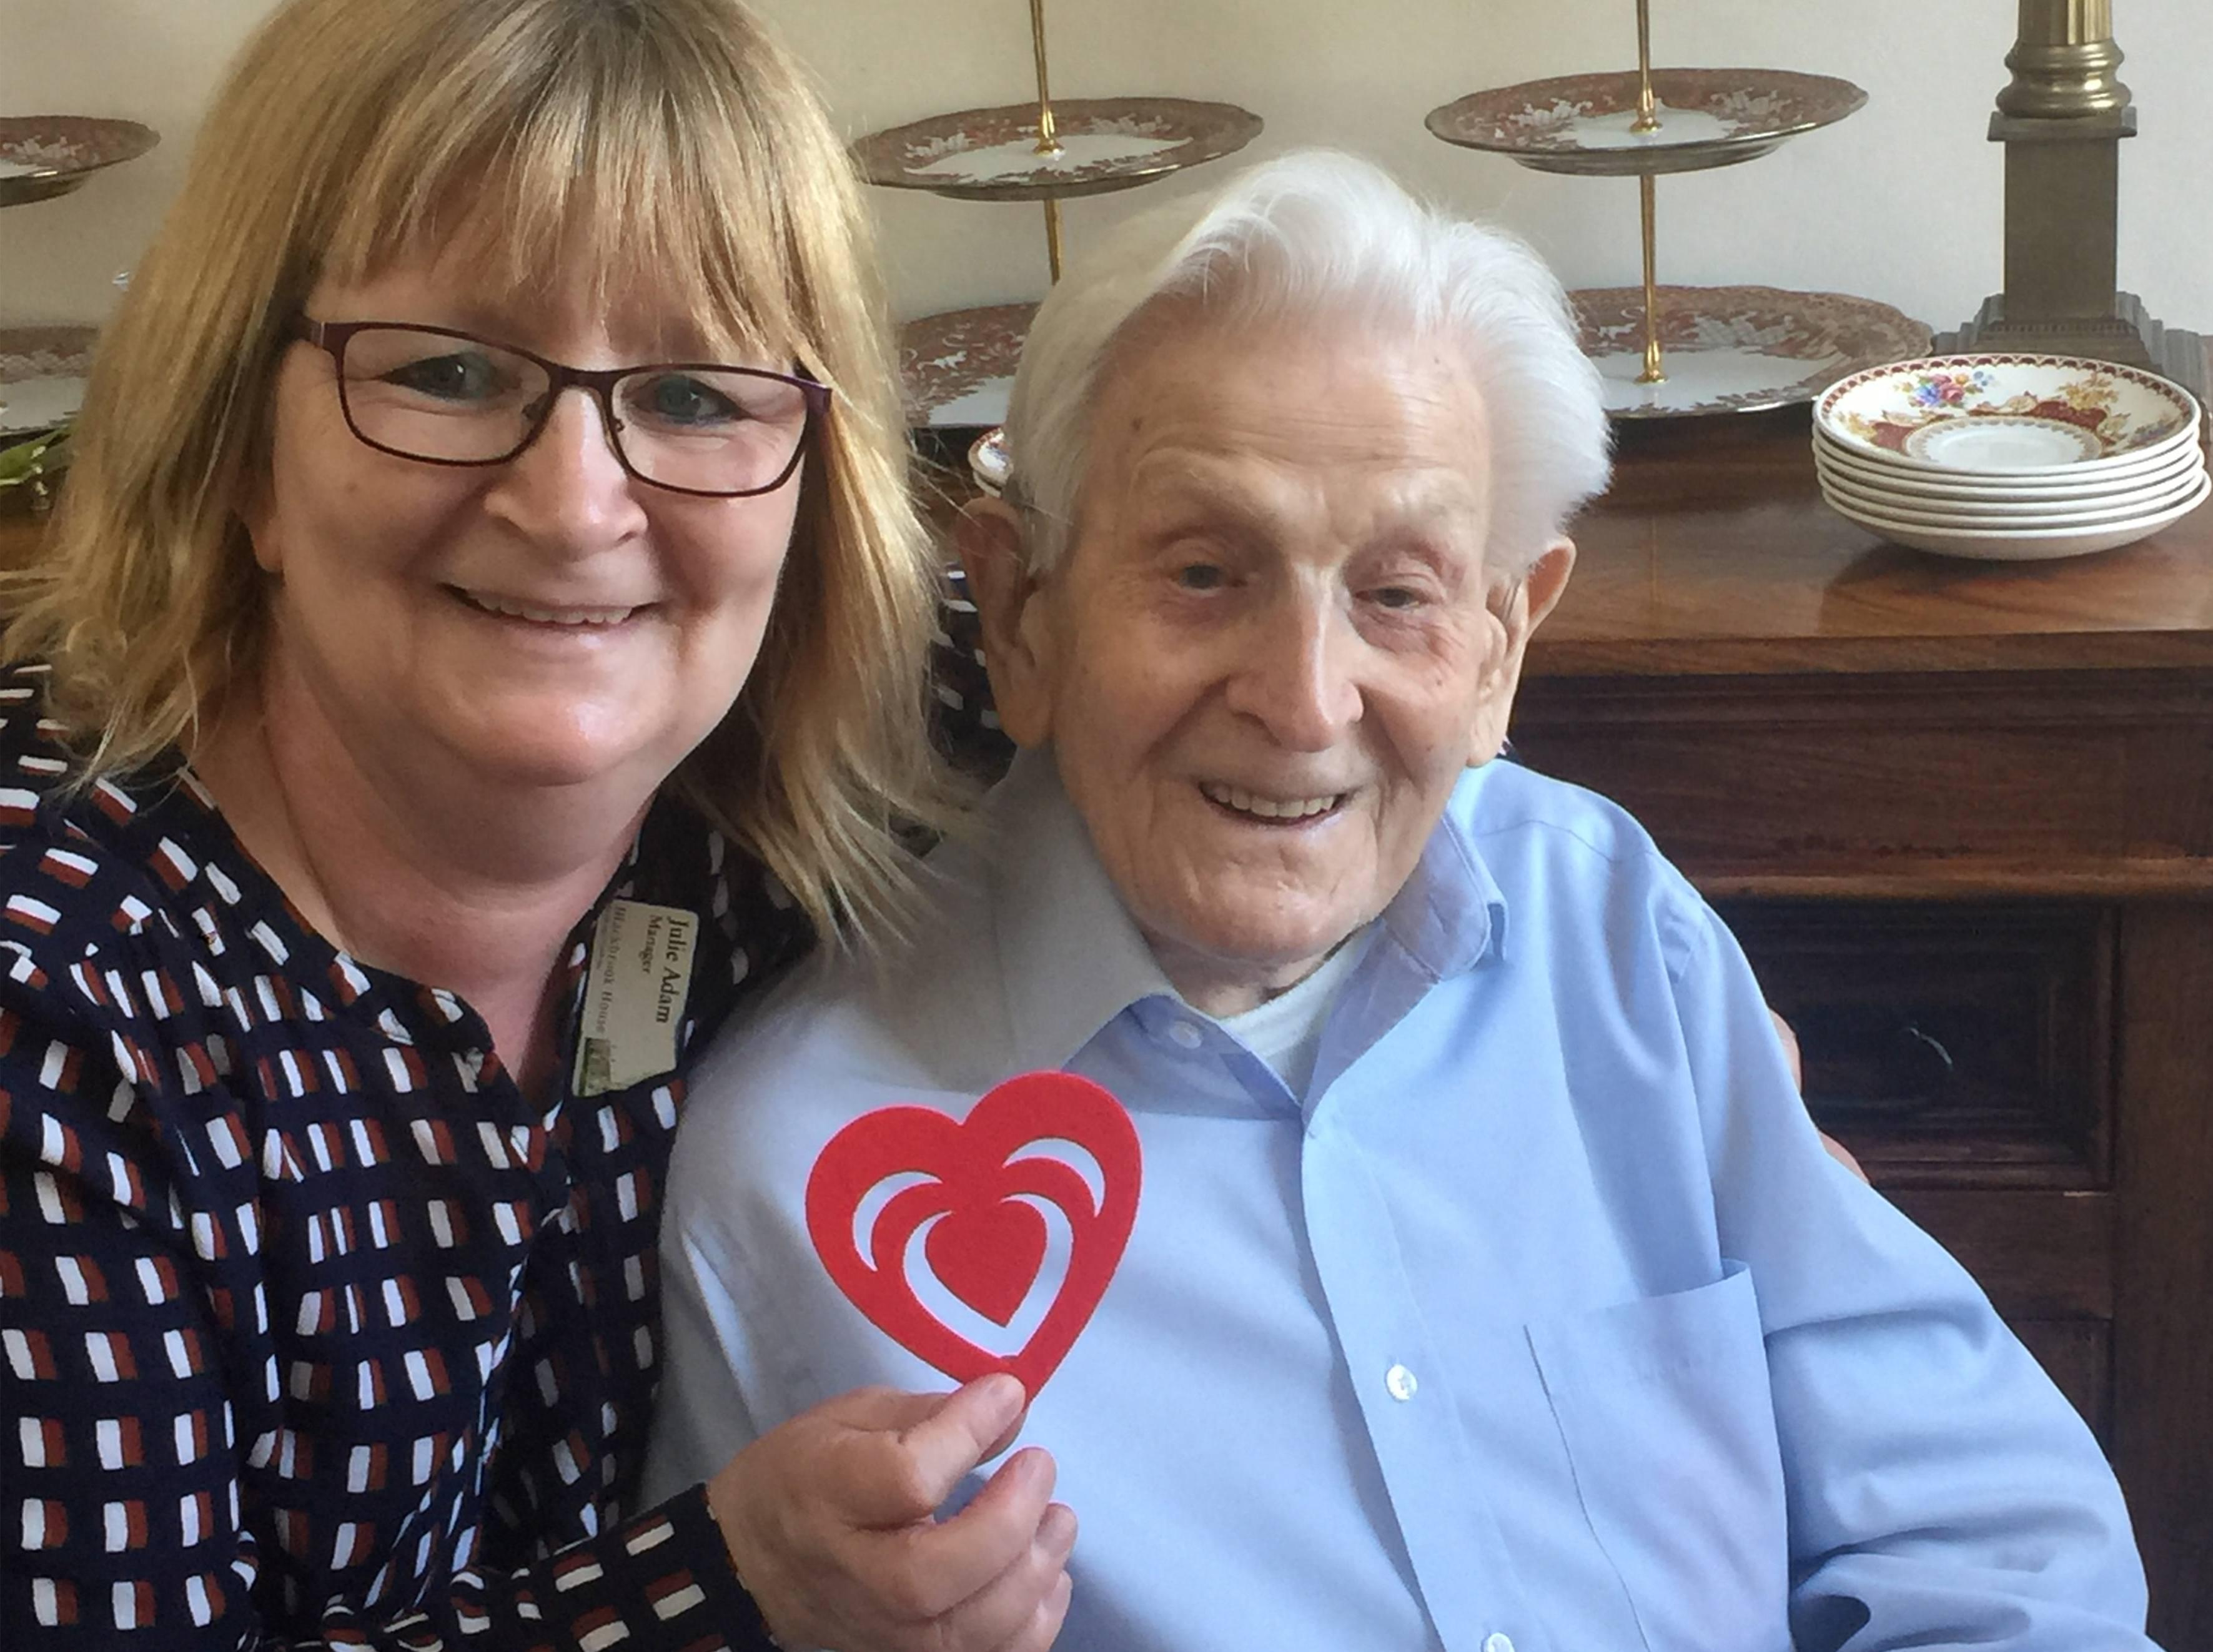 Manager Julie with centenarian Arthur